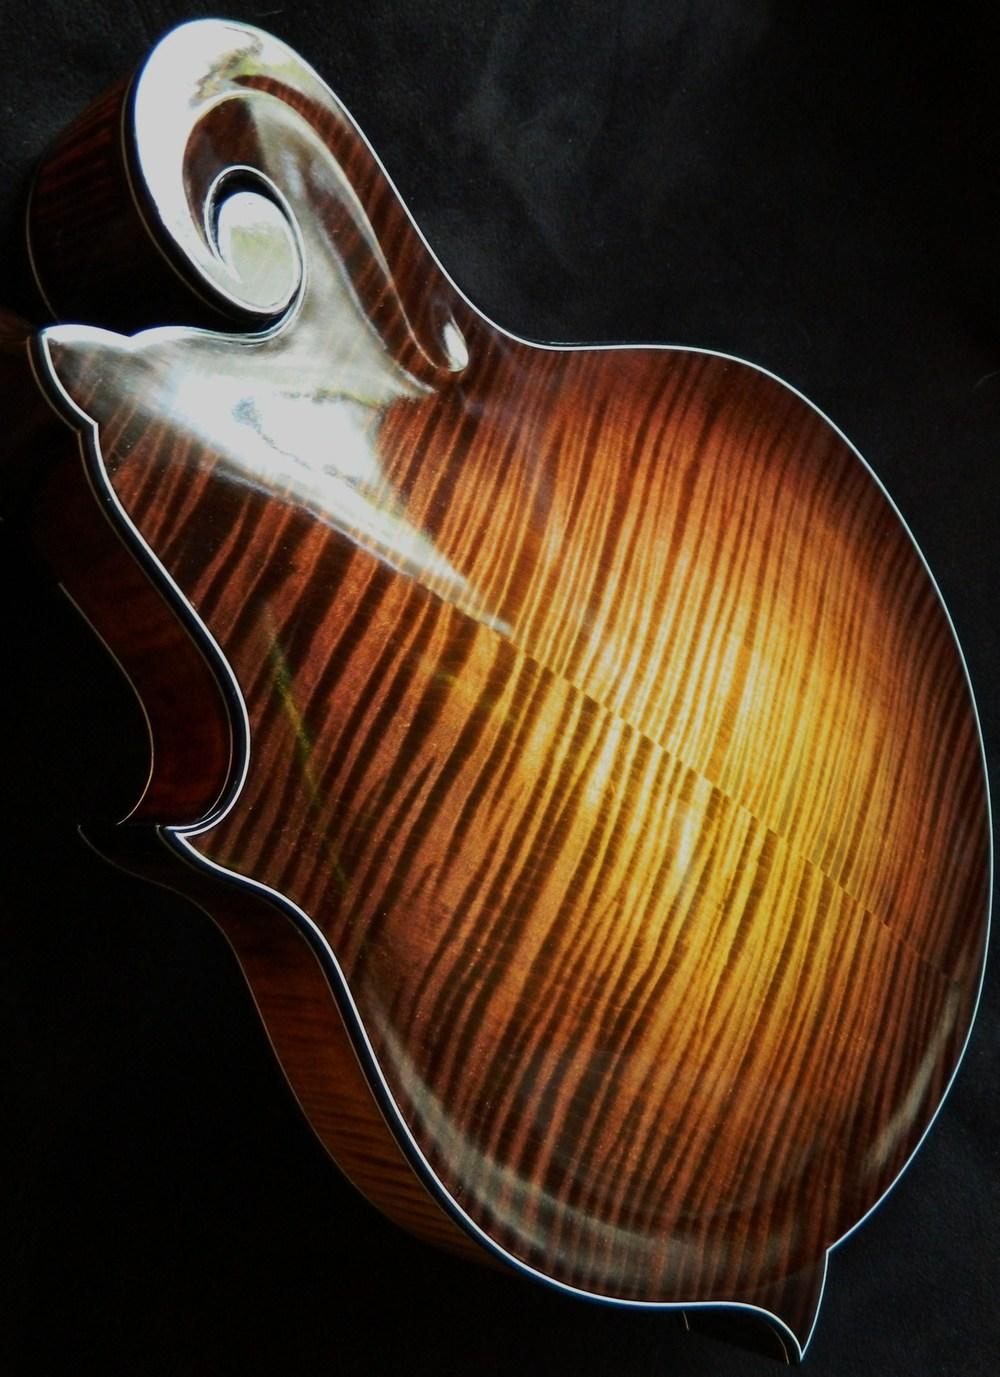 F8 mandolin, photo by Steve Sorensen.